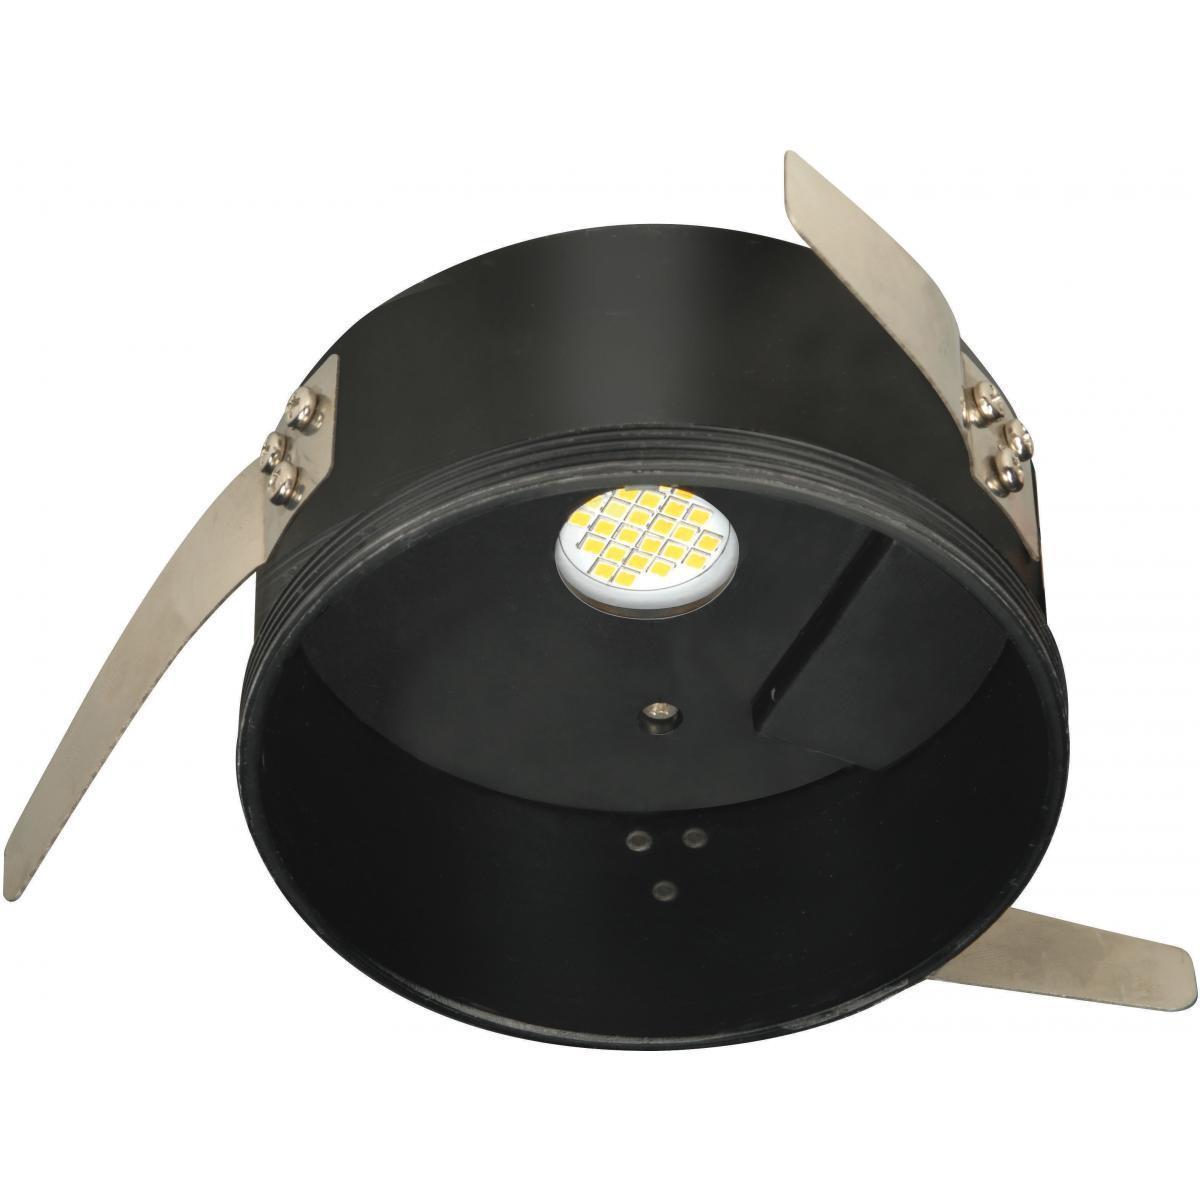 "SATCO 13.5W 5""- 6"" LED Downlight Retrofit Fixture - Base ..."